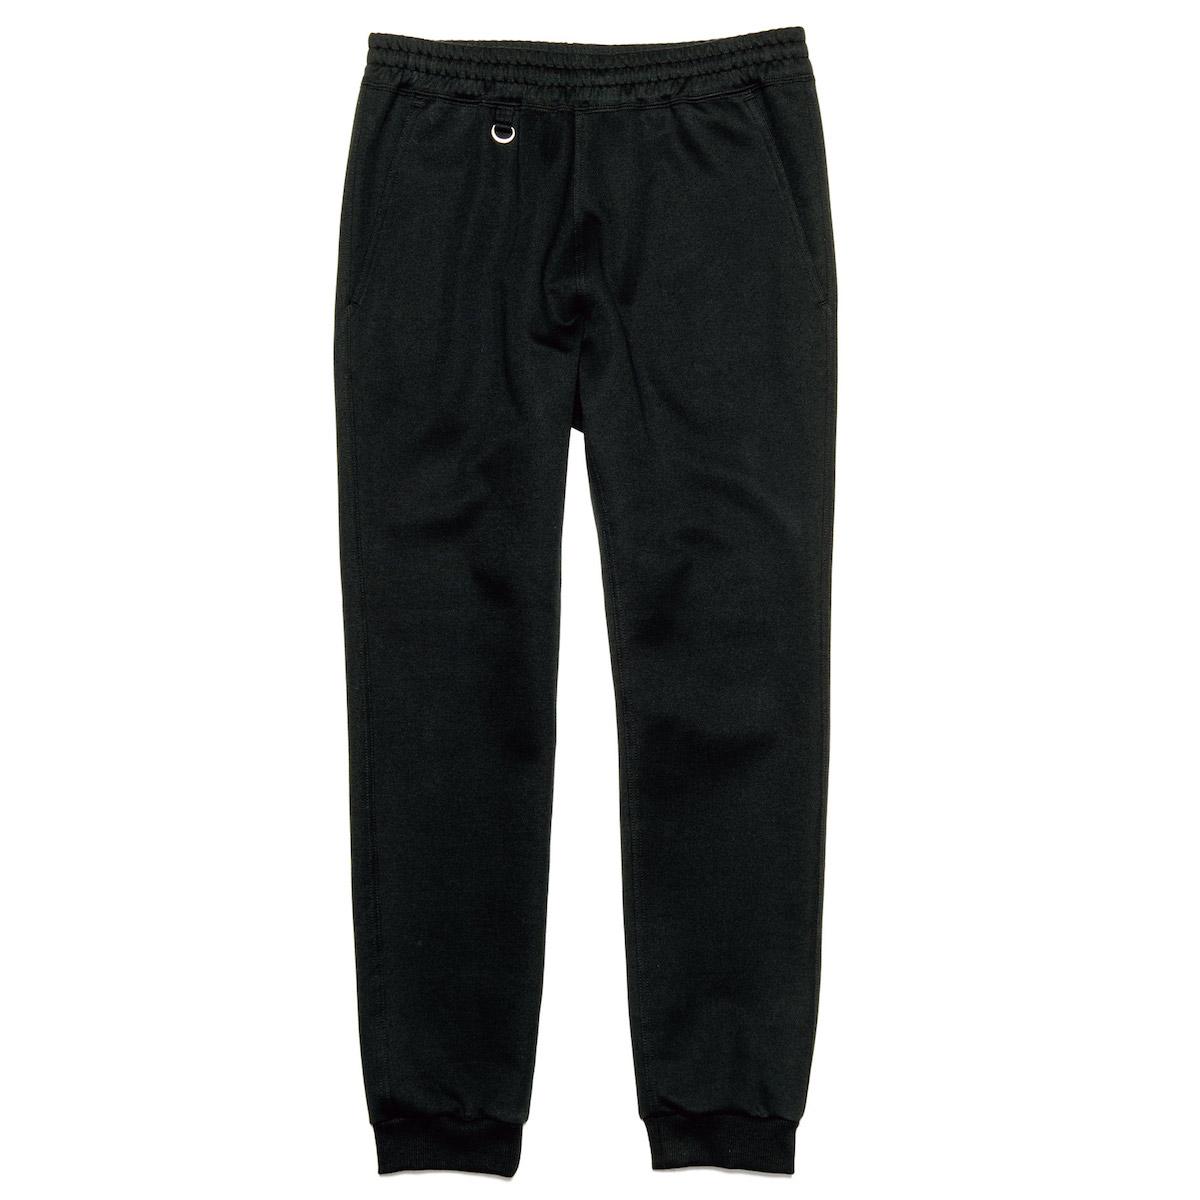 uniform experiment / SWEAT PANTS (Black)